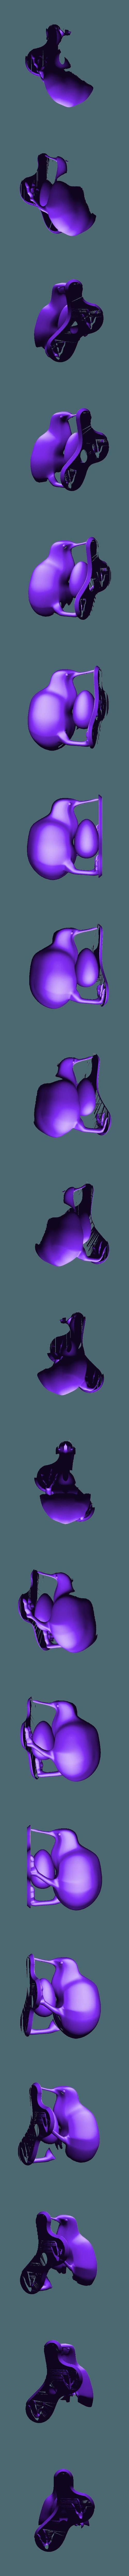 Kiwi_Smooth.stl Download free STL file Kiwi • Model to 3D print, Oggie